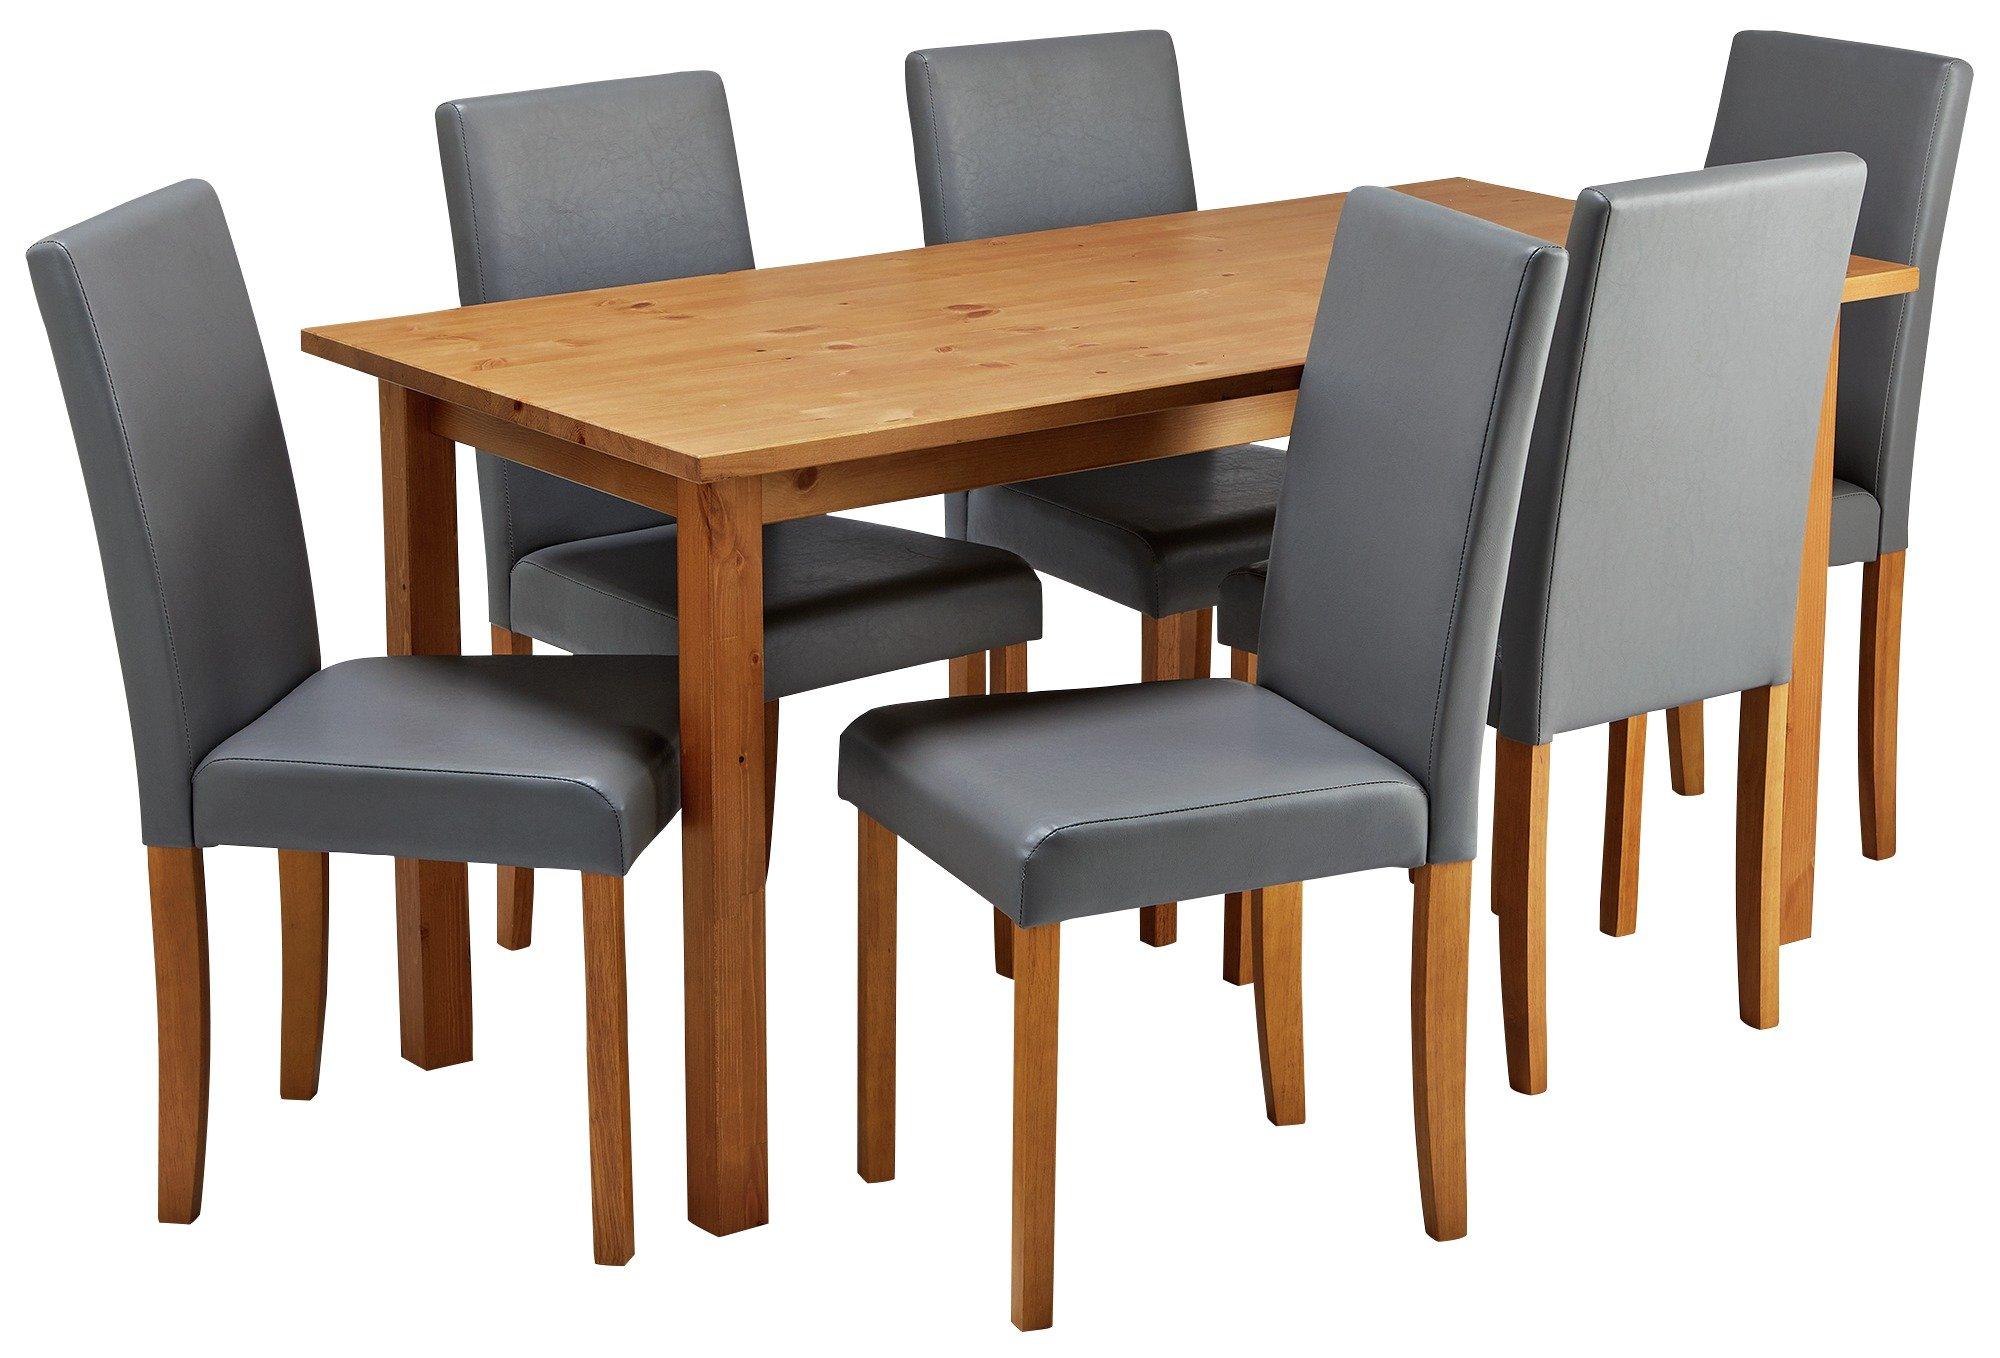 Habitat Ashdon Solid Wood Dining Table & 6 Grey Chairs